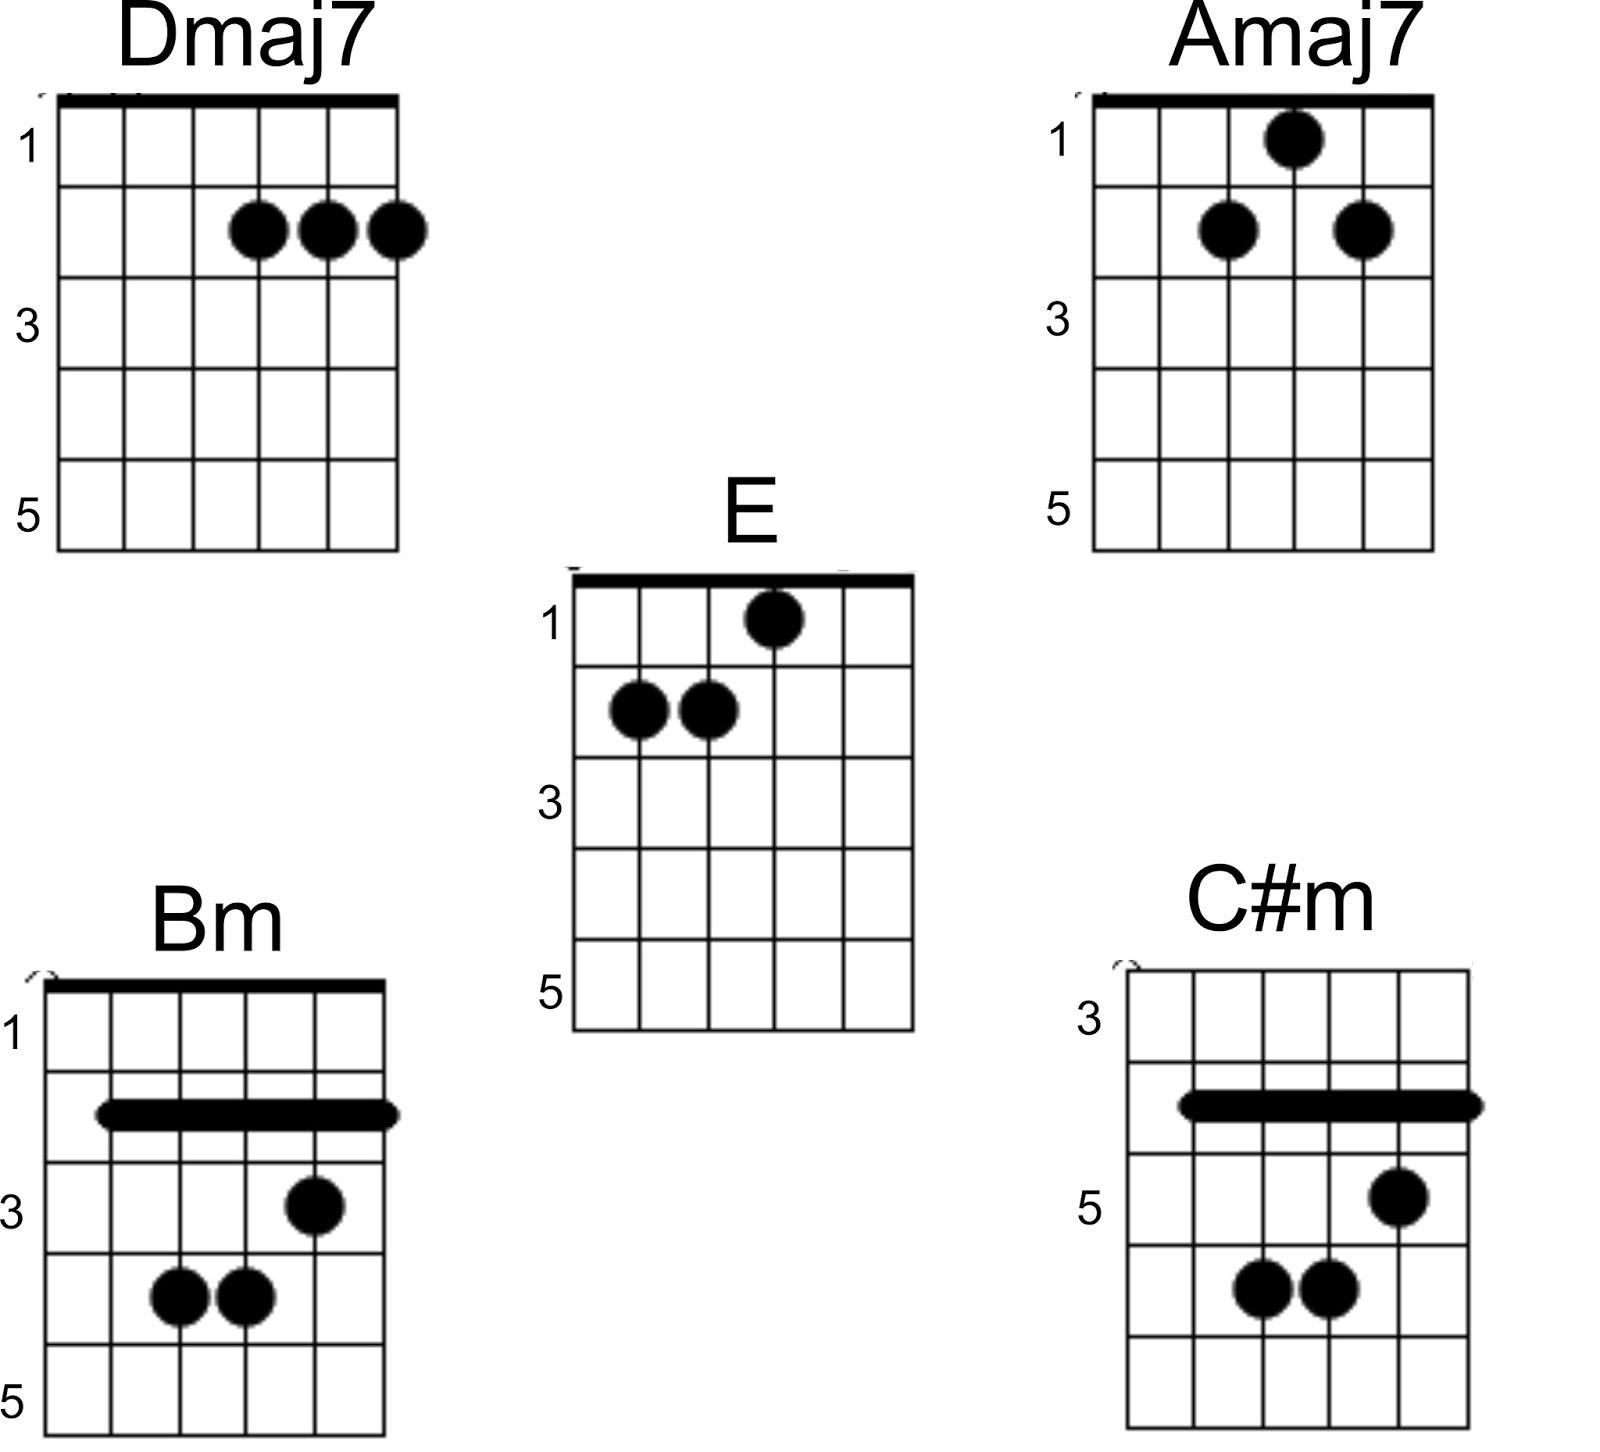 Cord Gitar Dasar: Chord Gitar C Kunci Gitar Kau Adalah Isyana Sarasvati Serba